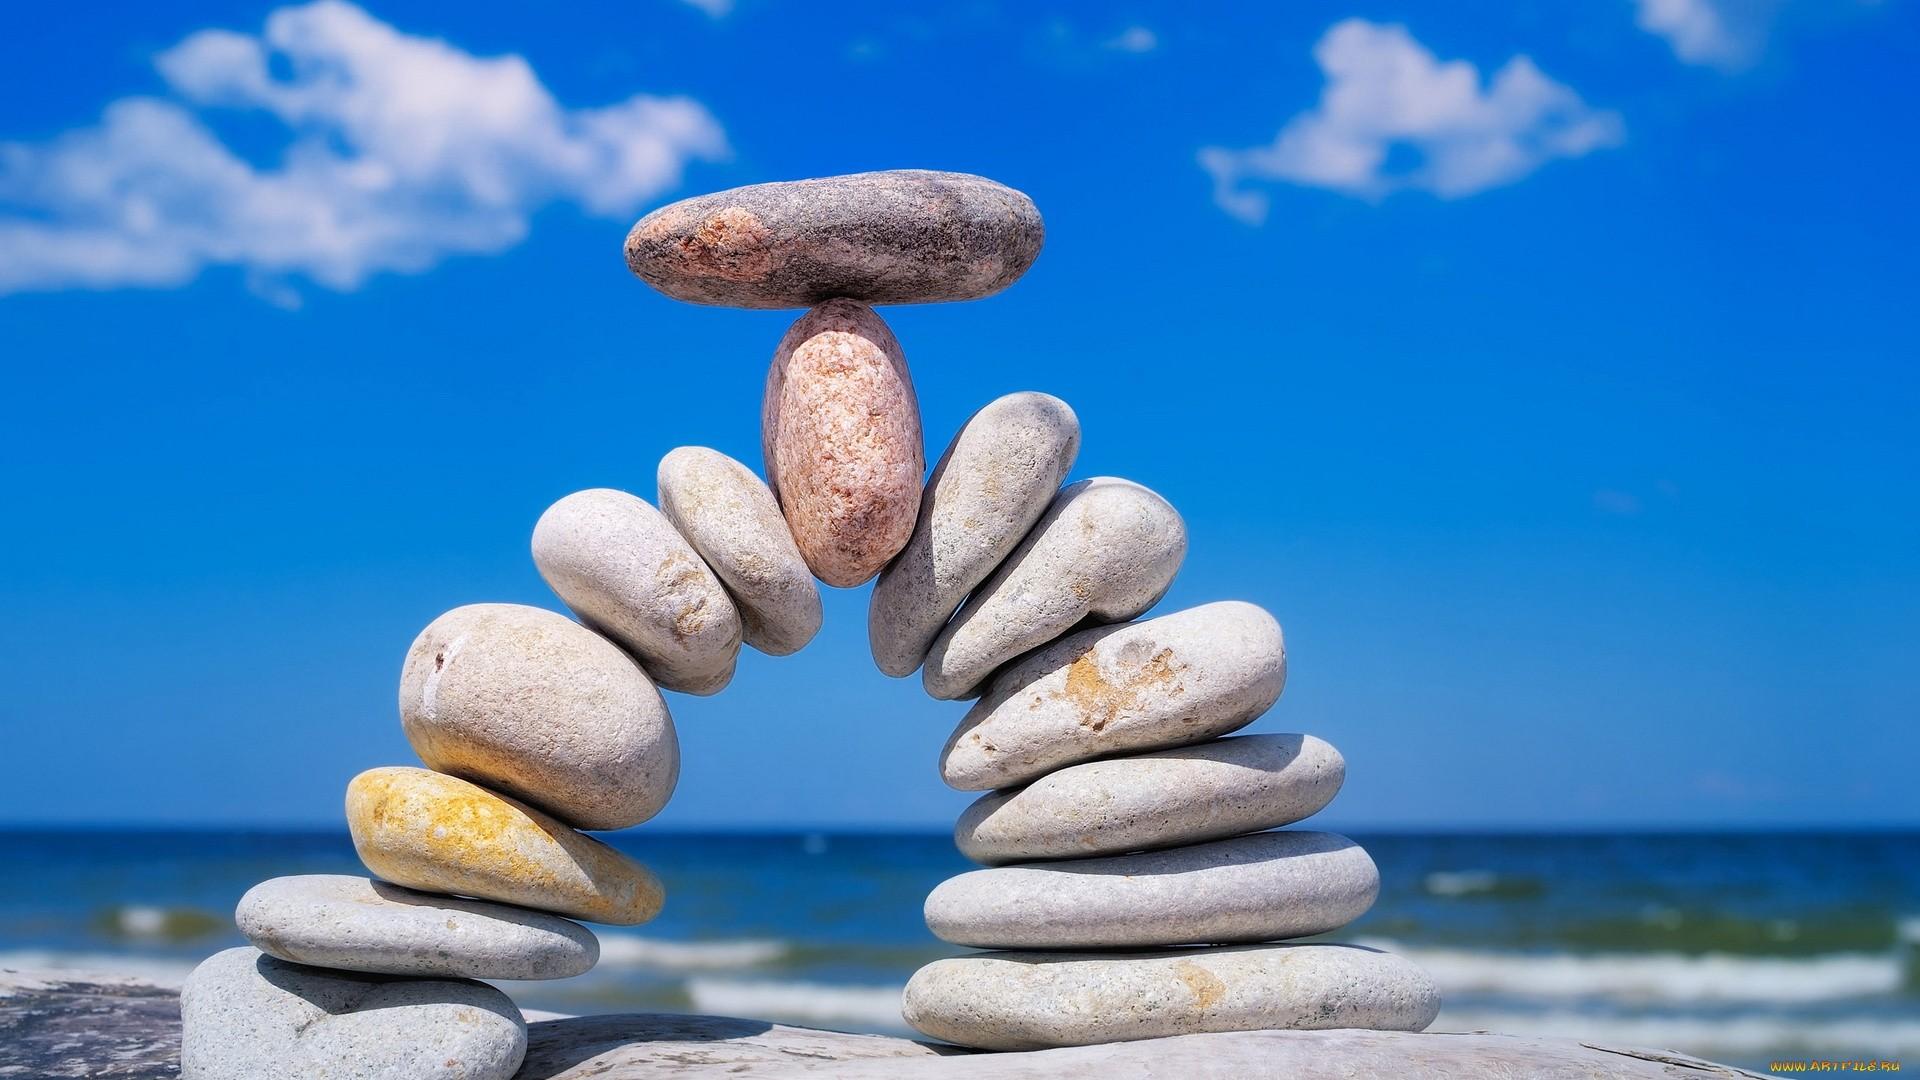 Zen Stone Pyramid wallpaper for desktop